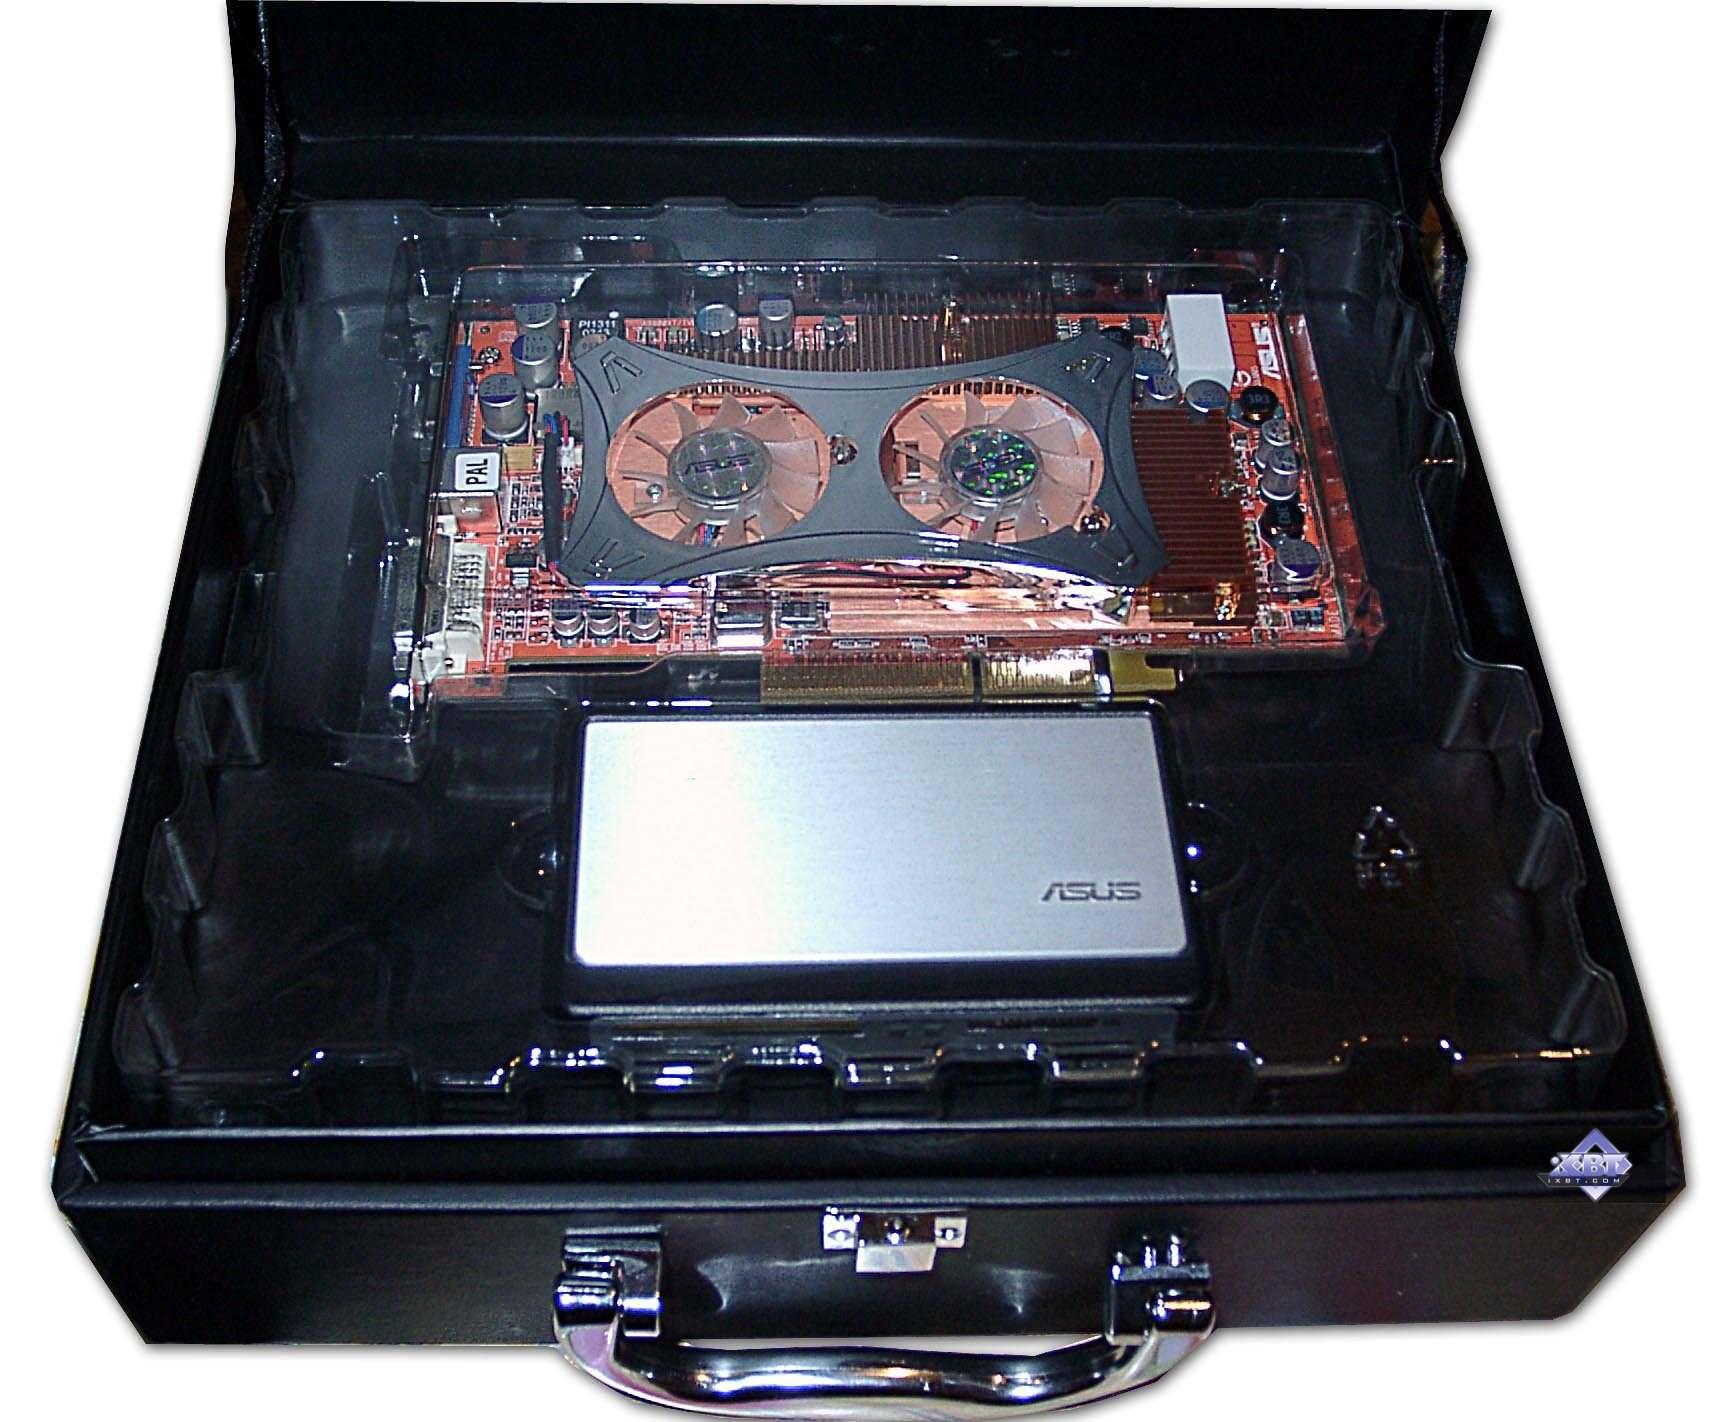 ATI Radeon 9800 XT - Page 2 | HotHardware